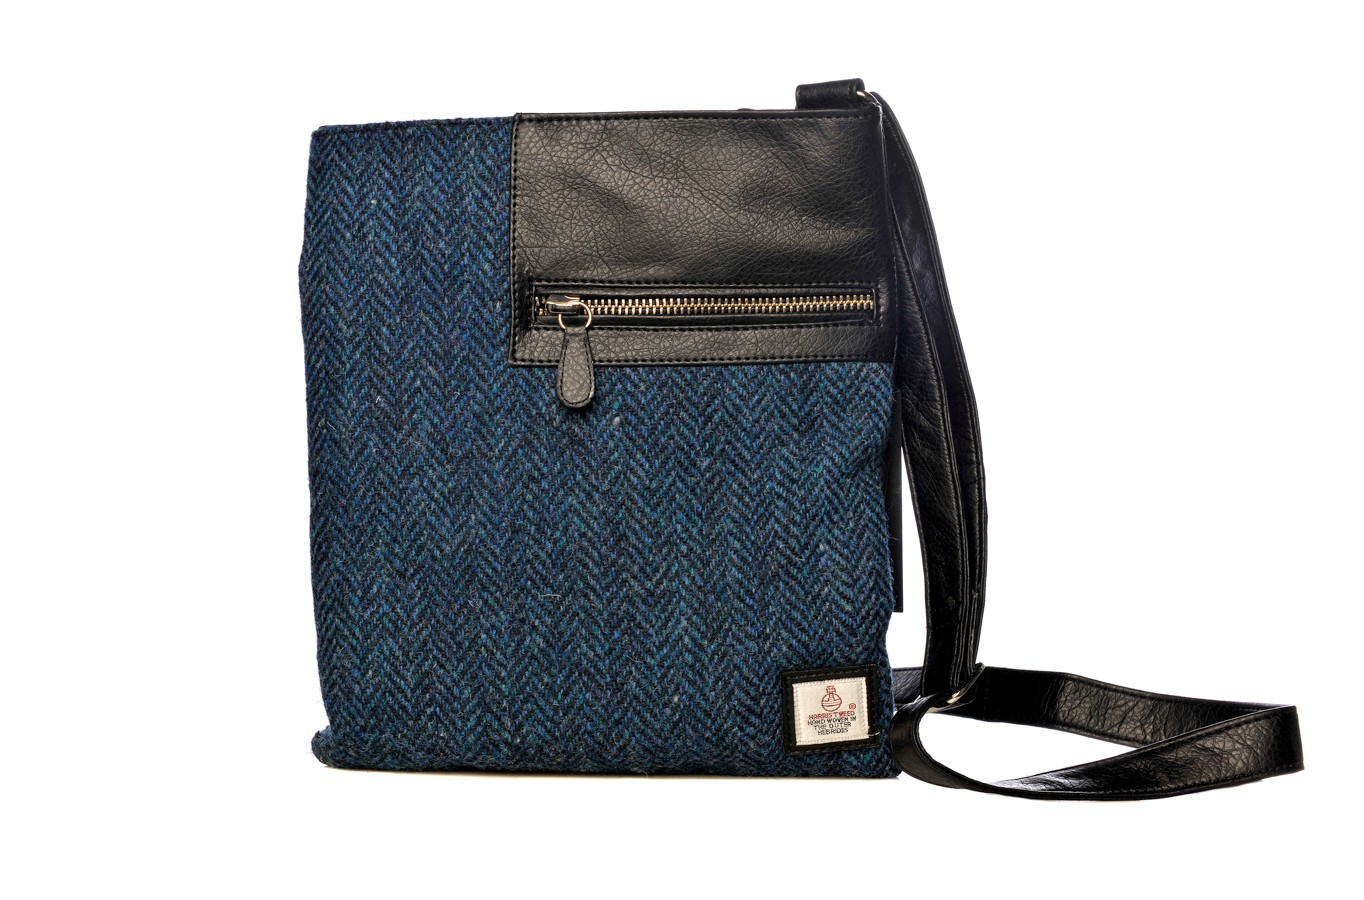 Maccessori Harris Tweed Medium Cross Body Bag in Blue Herringbone